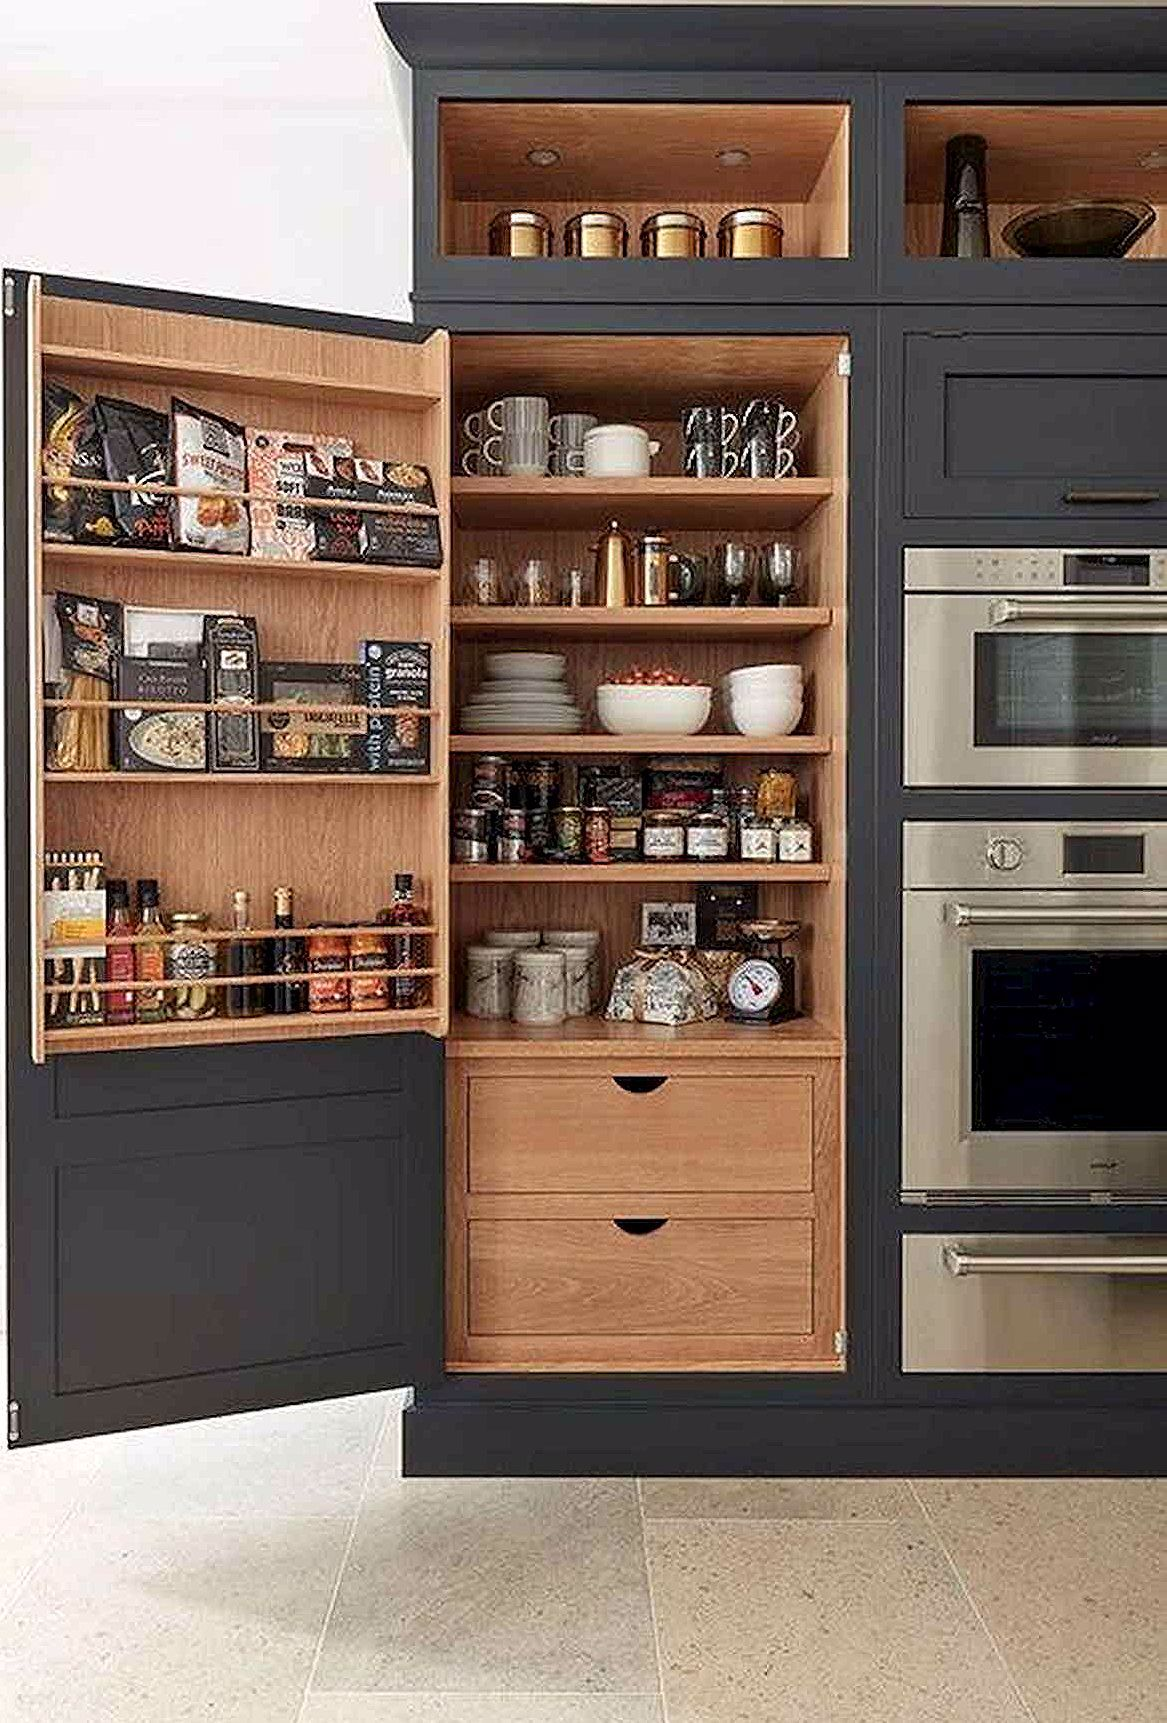 9 Lovely DIY Projects Furniture Kitchen Storage Design Ideas diy ...